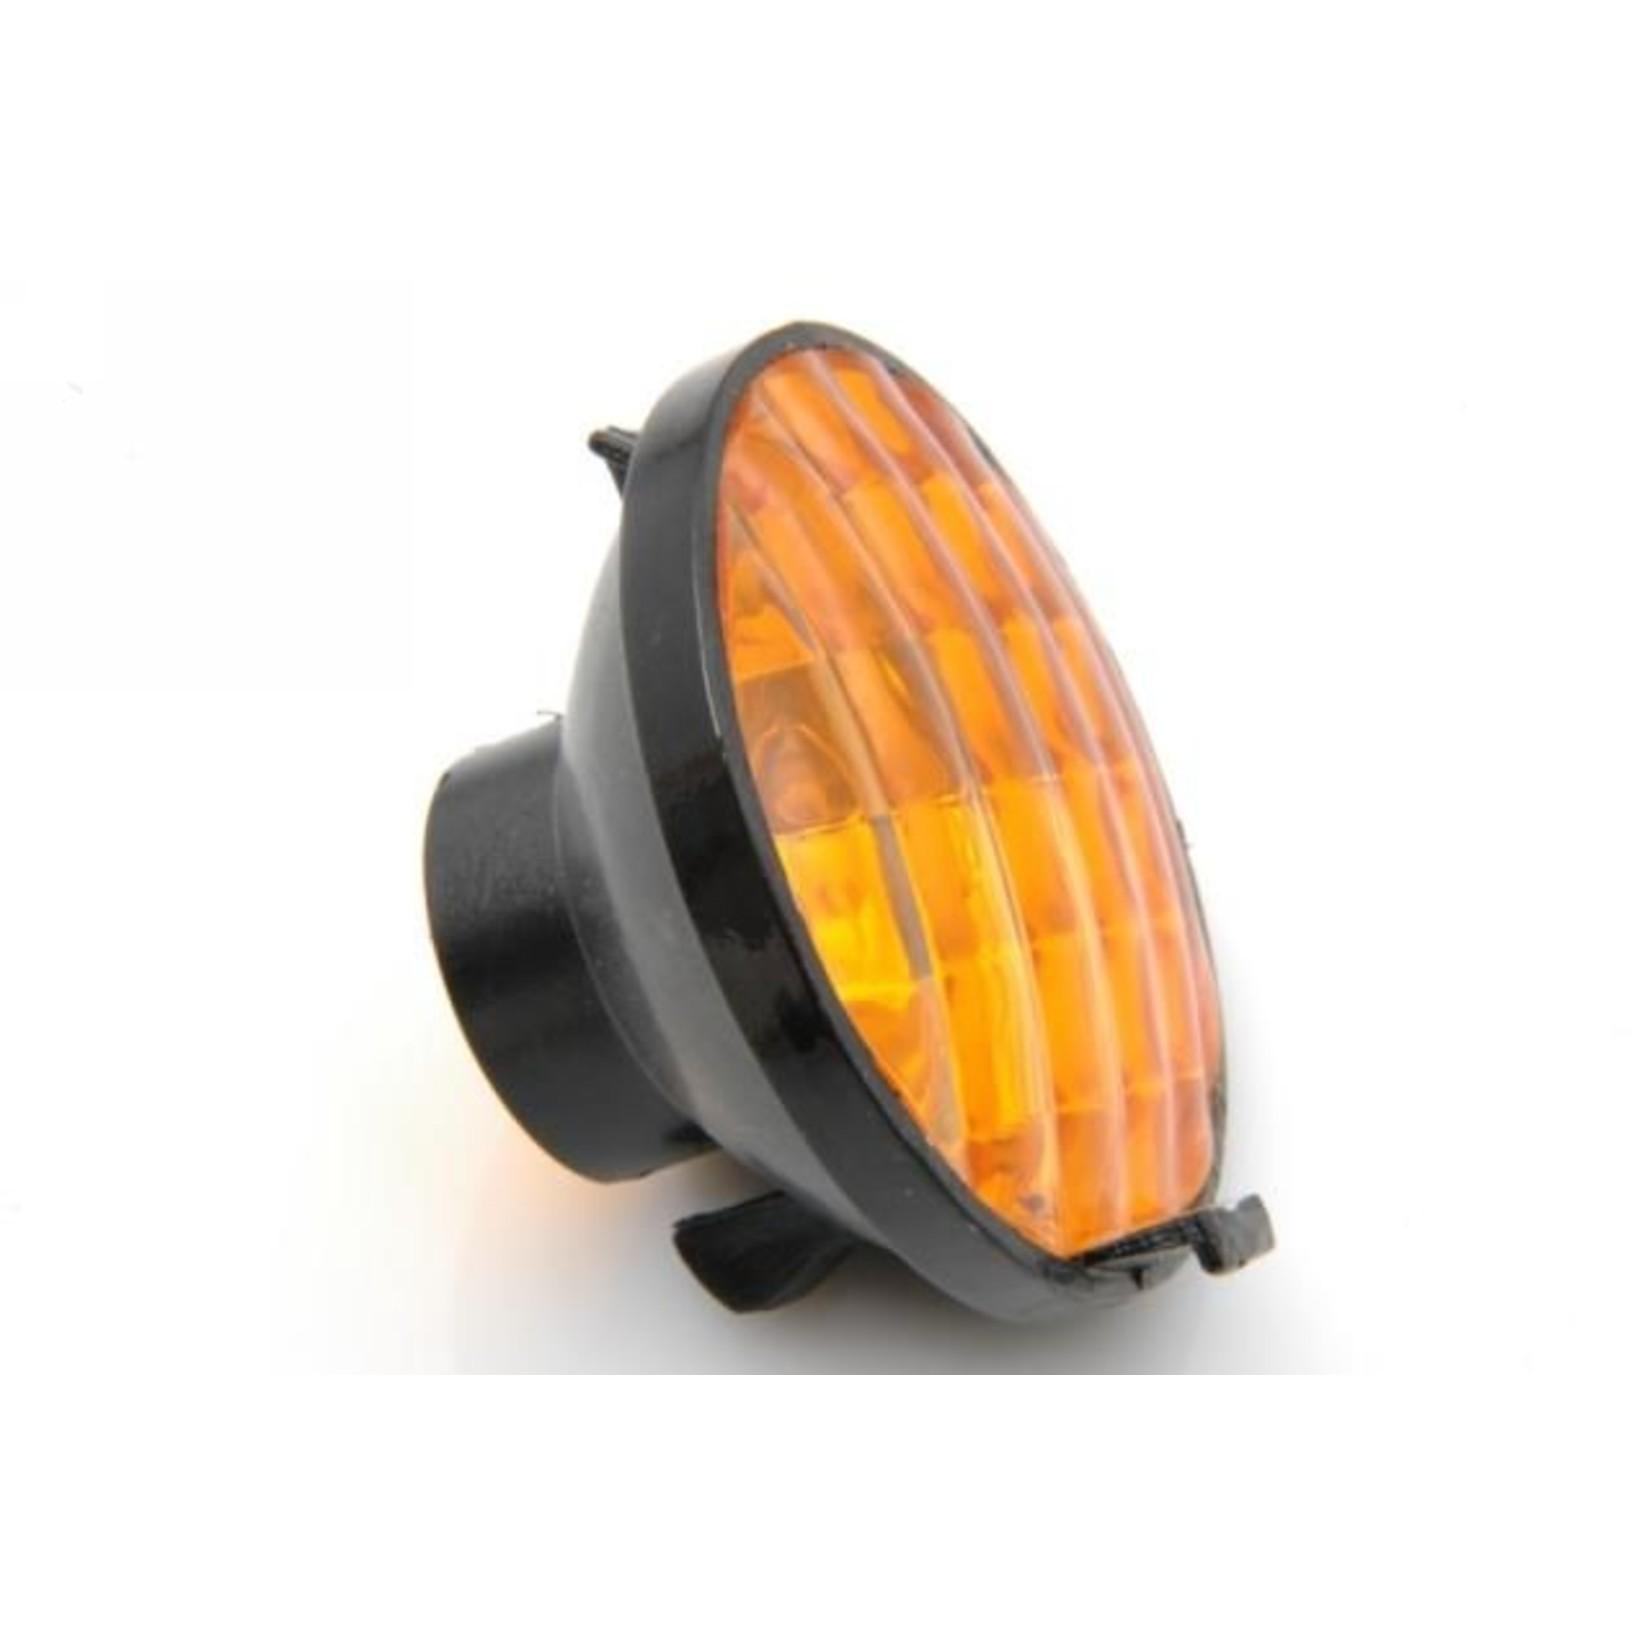 Intermitente trasera sin porta lampara Nr Org: DX575215A